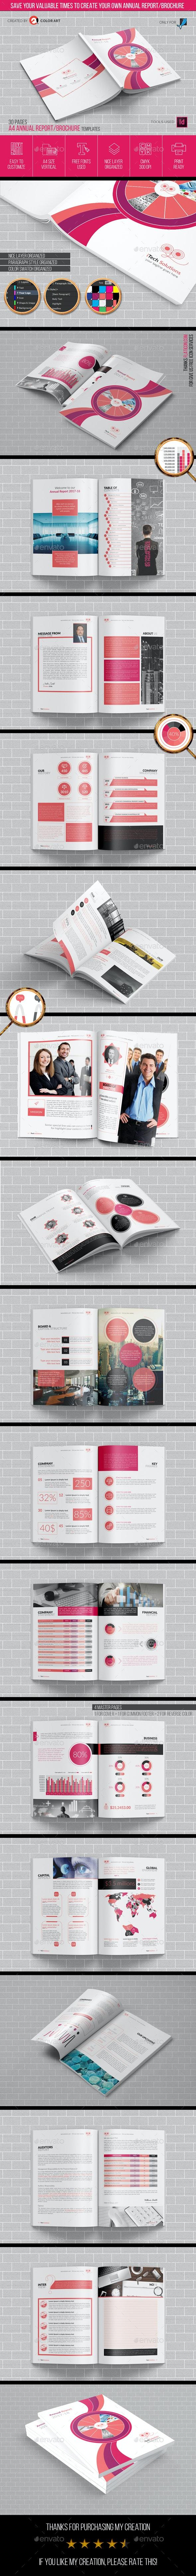 Annual Report Brochure Template 2017-18 - Brochures Print Templates